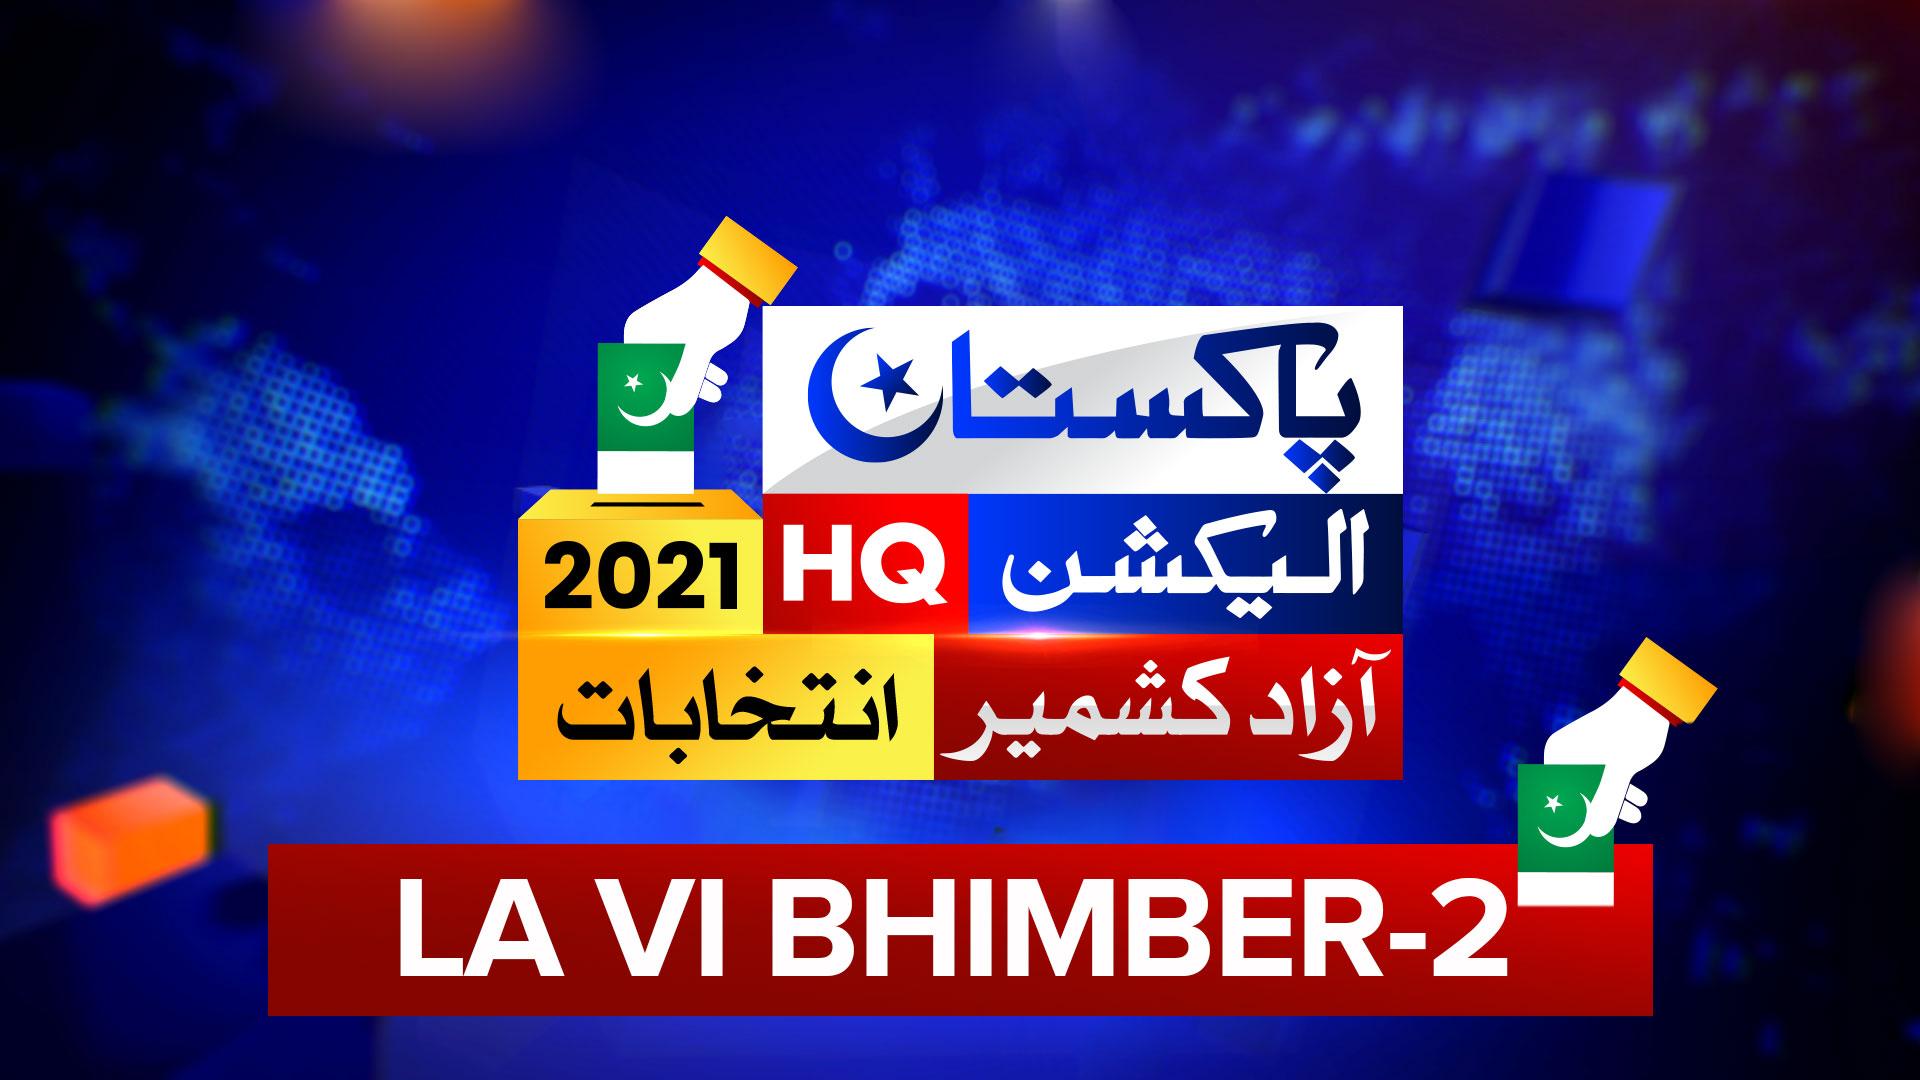 LA 6 BHIMBER 2 - AJK Election Results 2021